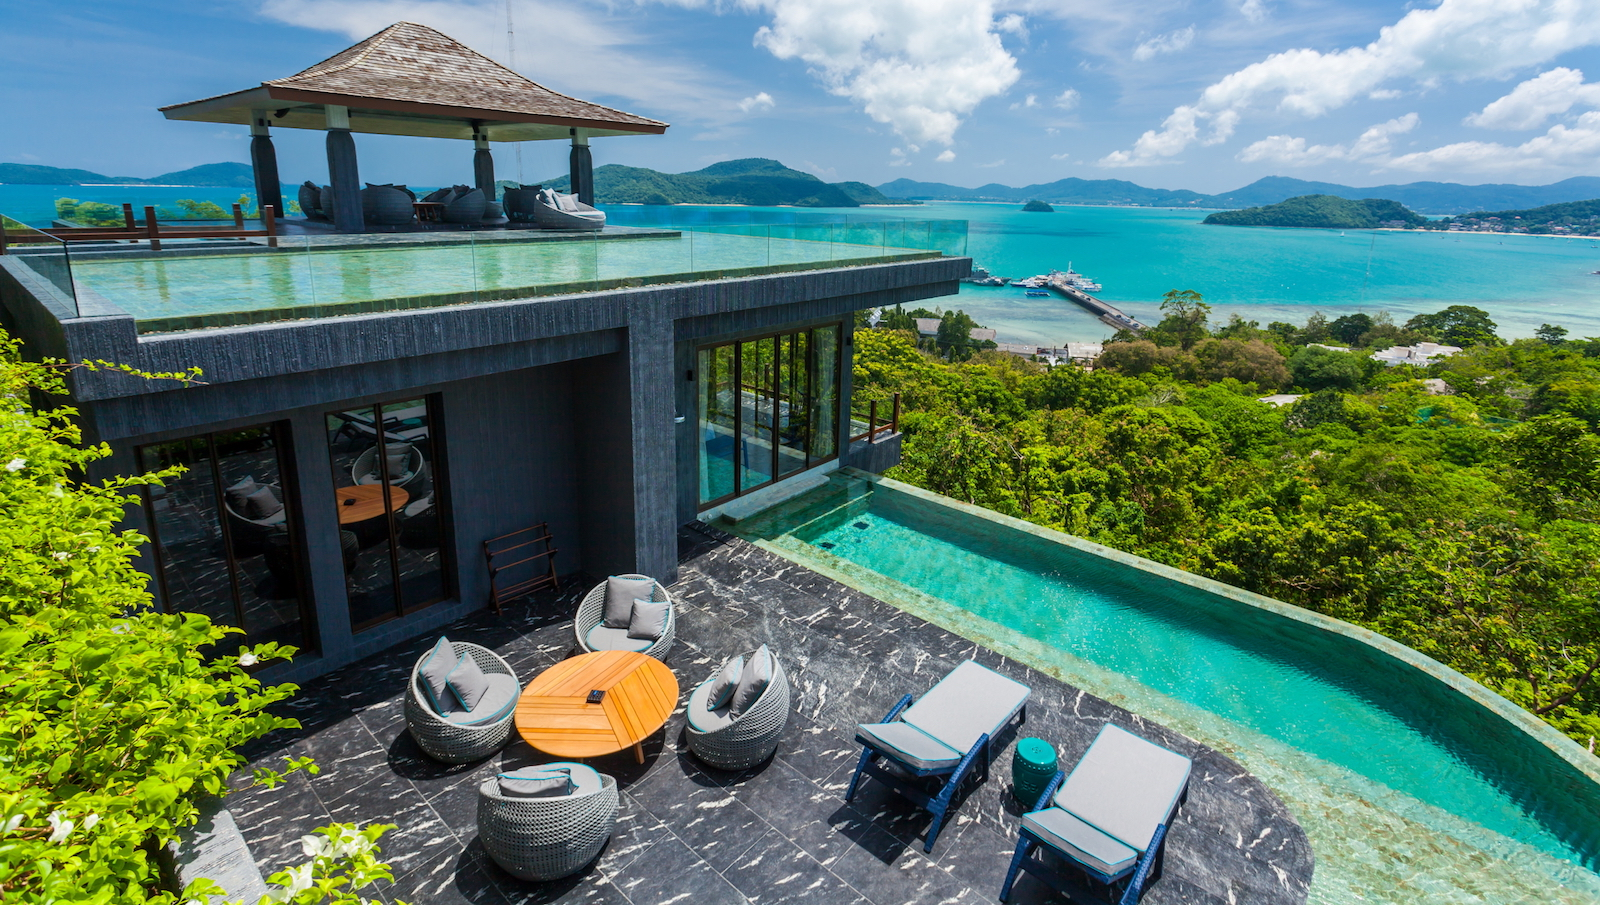 Sri Panwa S X24 Phuket S Most Expensive Holiday Villa Cnn